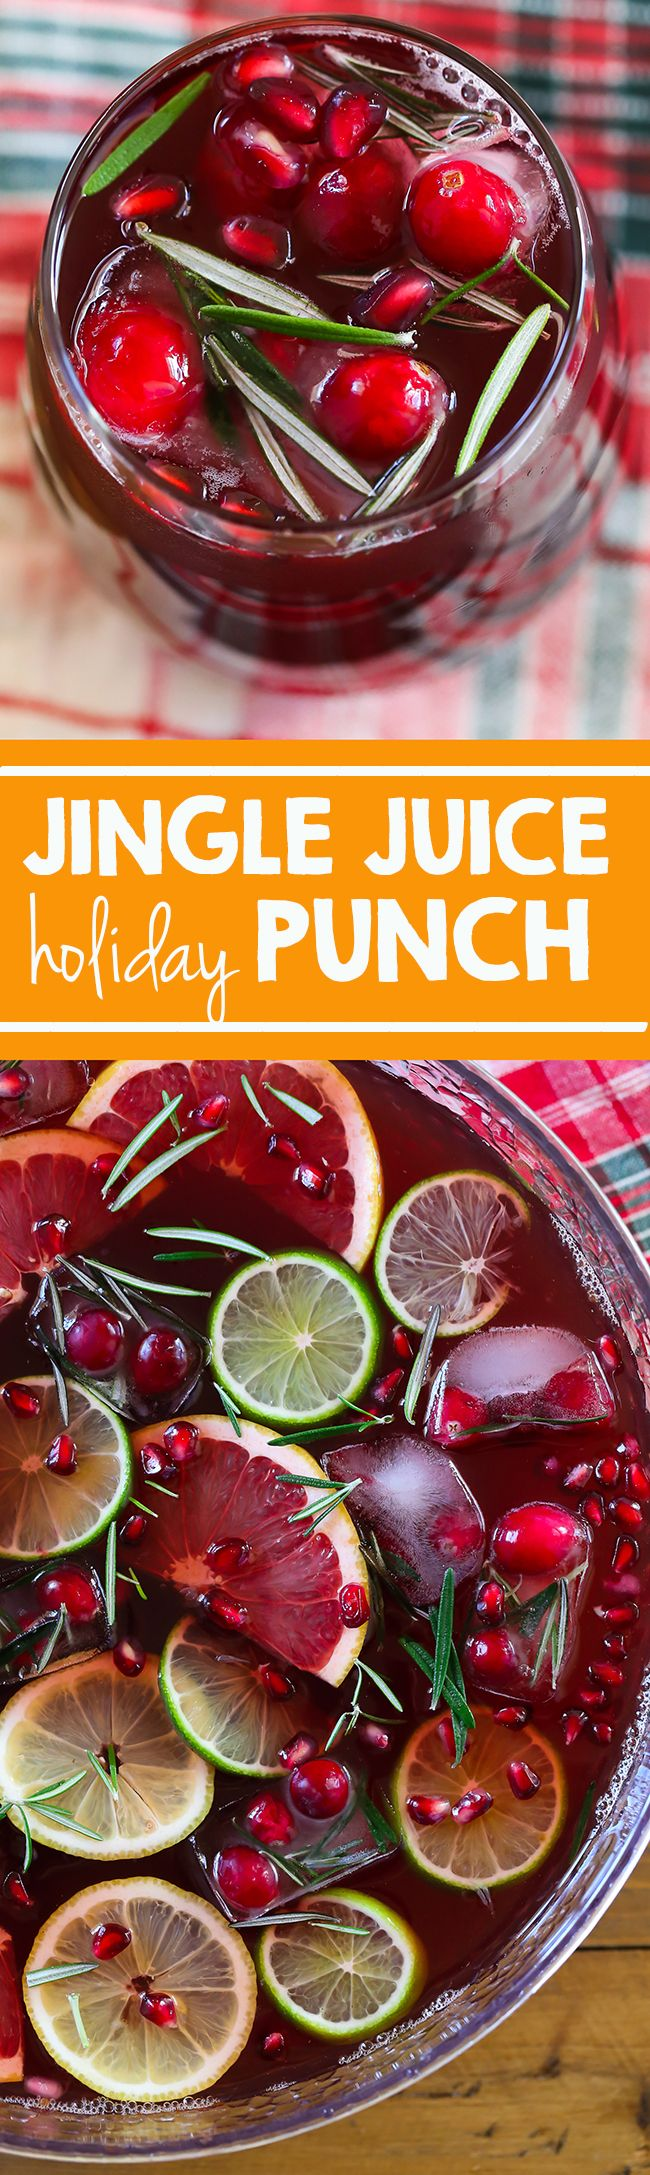 Jingle Juice Holiday Punch - Swanky Recipes - Sweet Tea I Holiday Drink I Holiday Beverage I Christmas Food I Cranberry I Pomegranate I Santa I Winter I Party food  #christmas #jinglejuice #drink